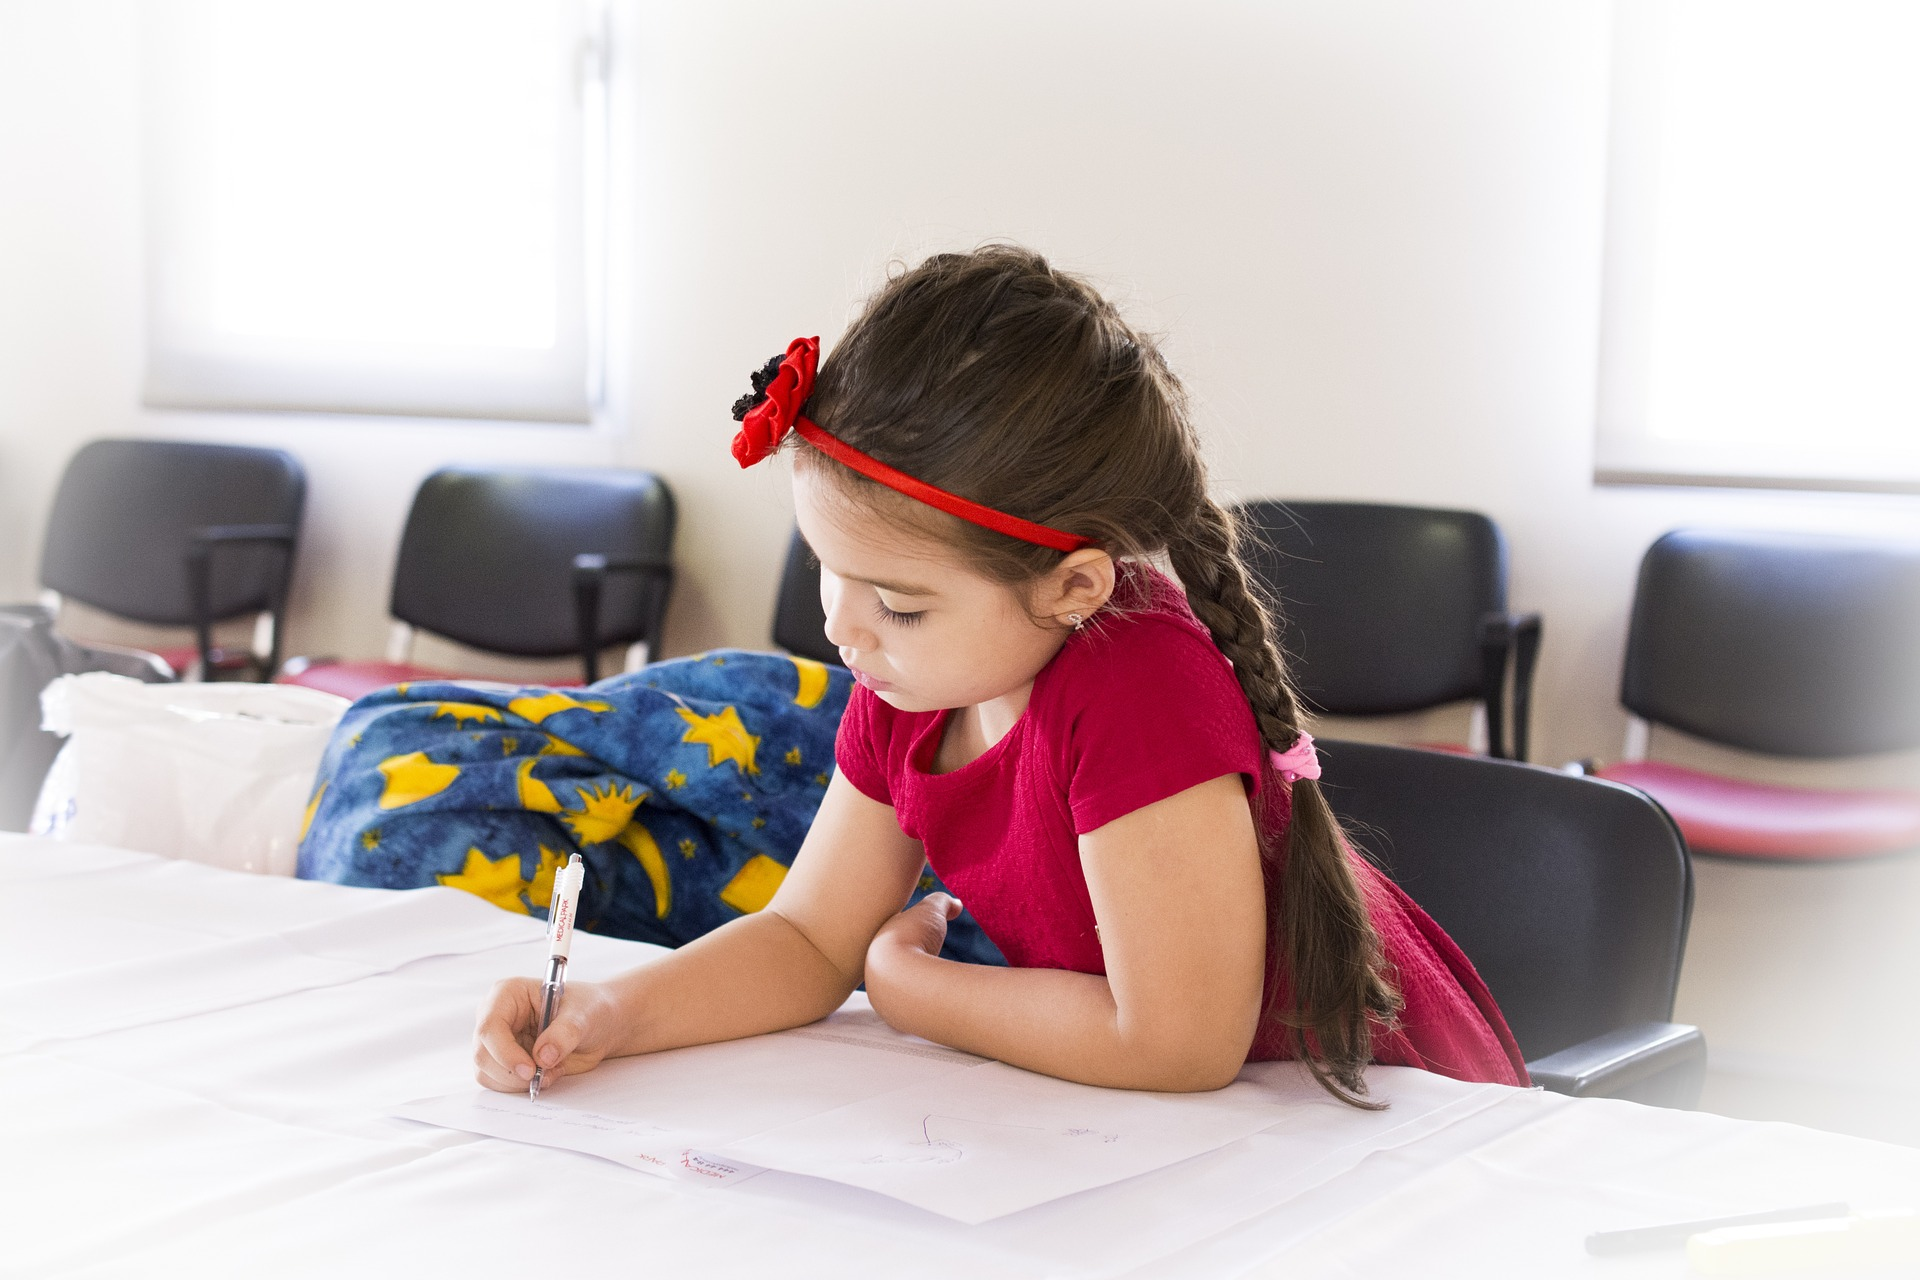 GIRL IS WRITING HOMEWORK